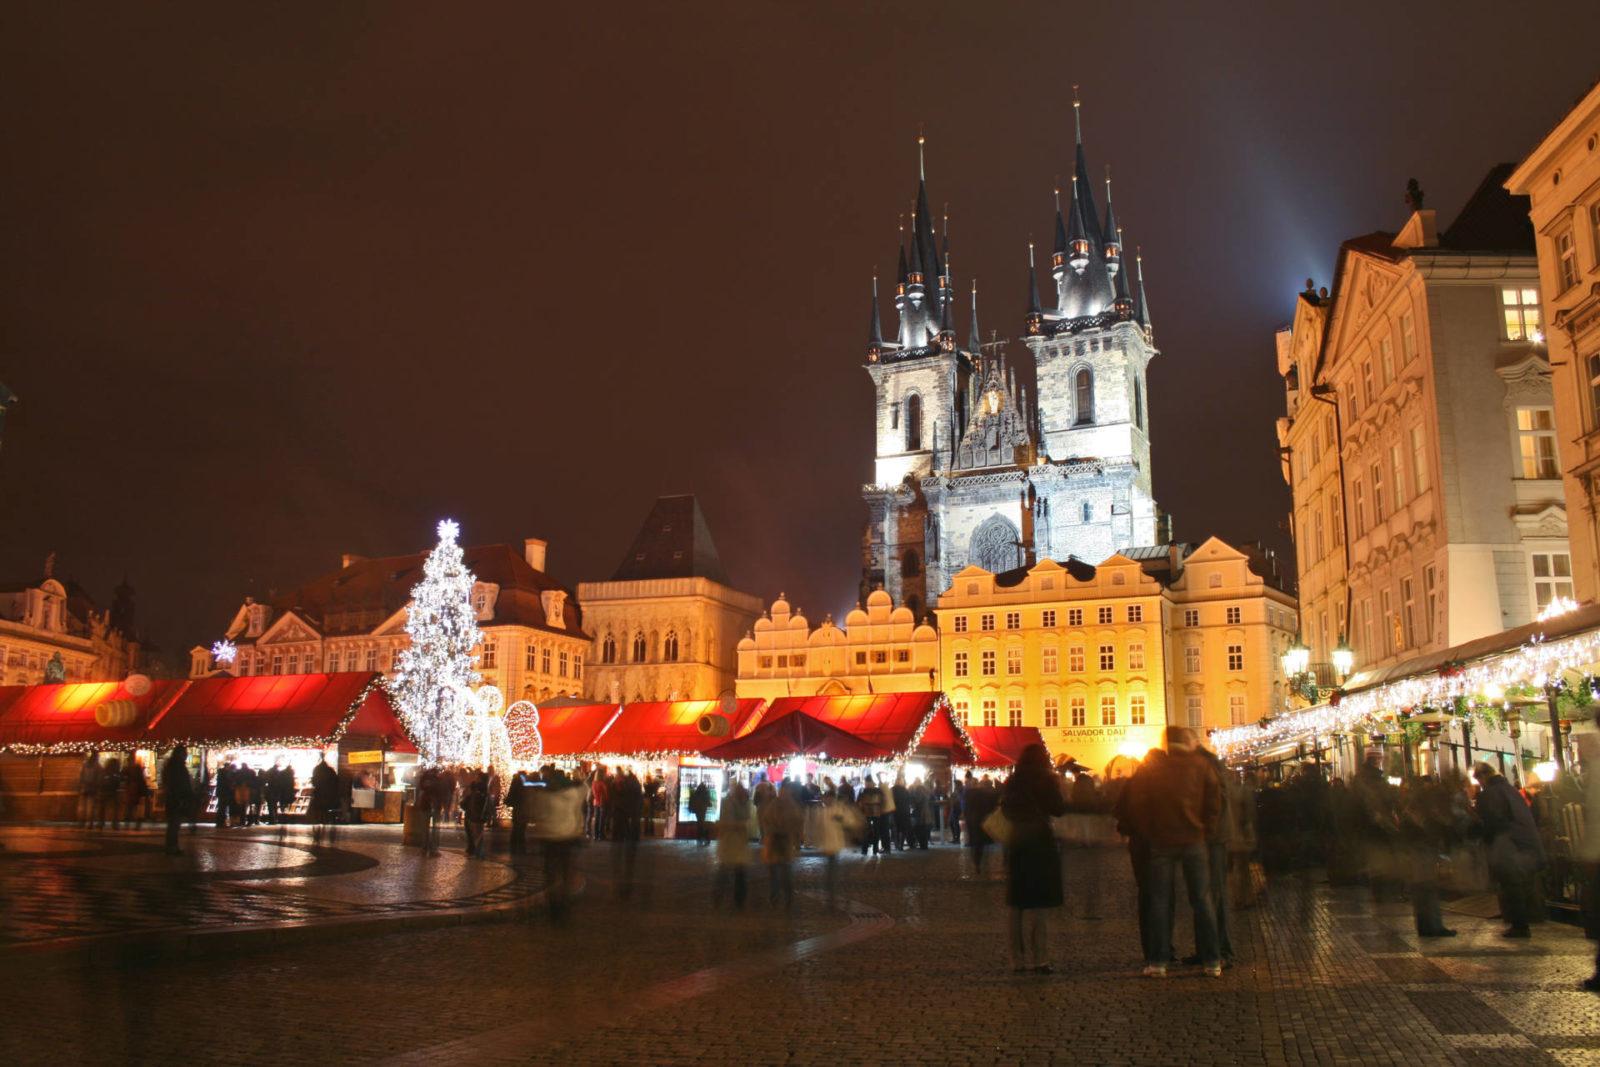 Vánoce Praha Christmas Market